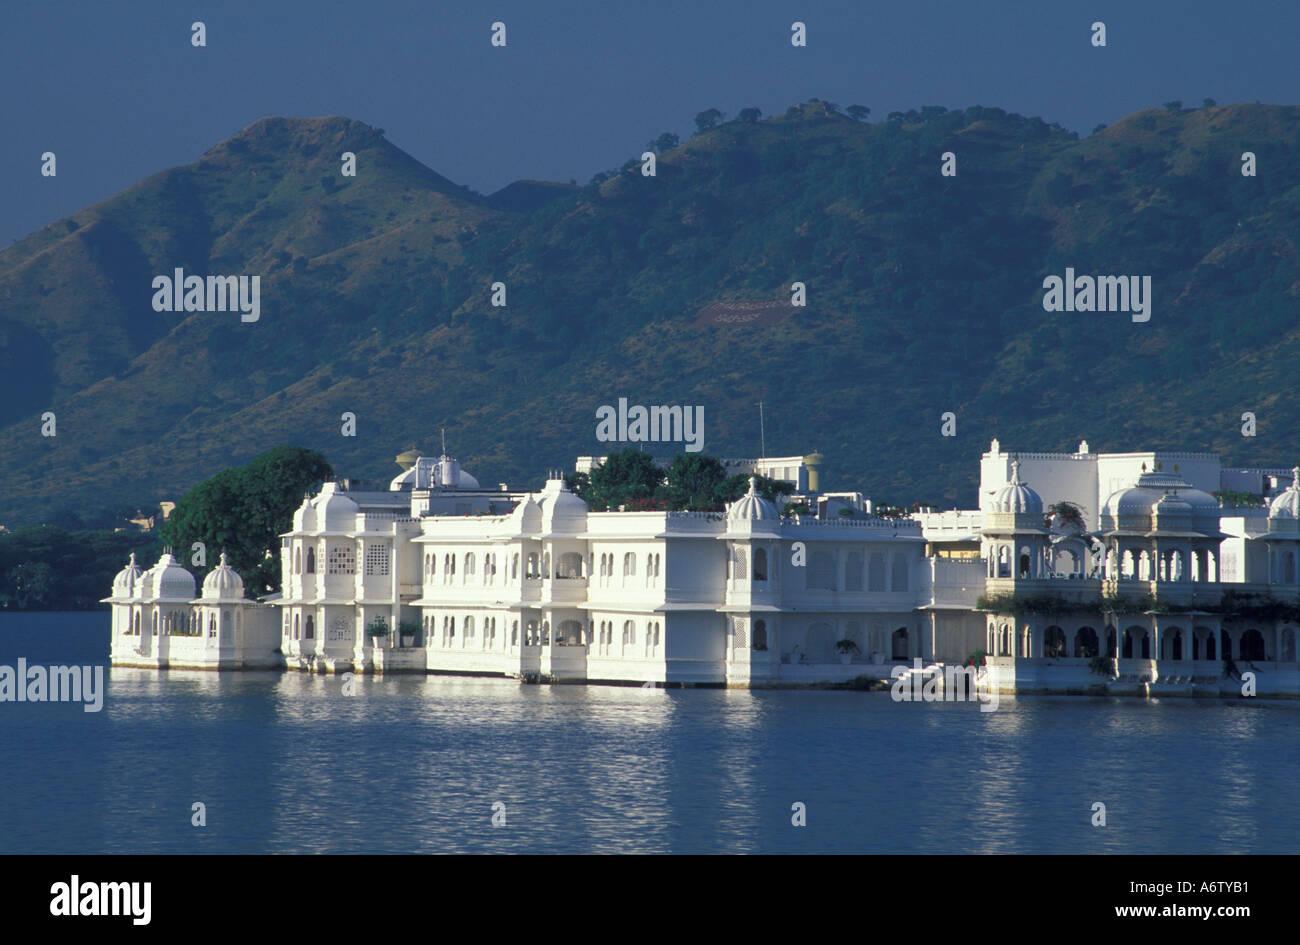 India, Rajasthan, Pichola Lake. Lake Palace Hotel, summer palace for city's rulers. Built 1746. - Stock Image